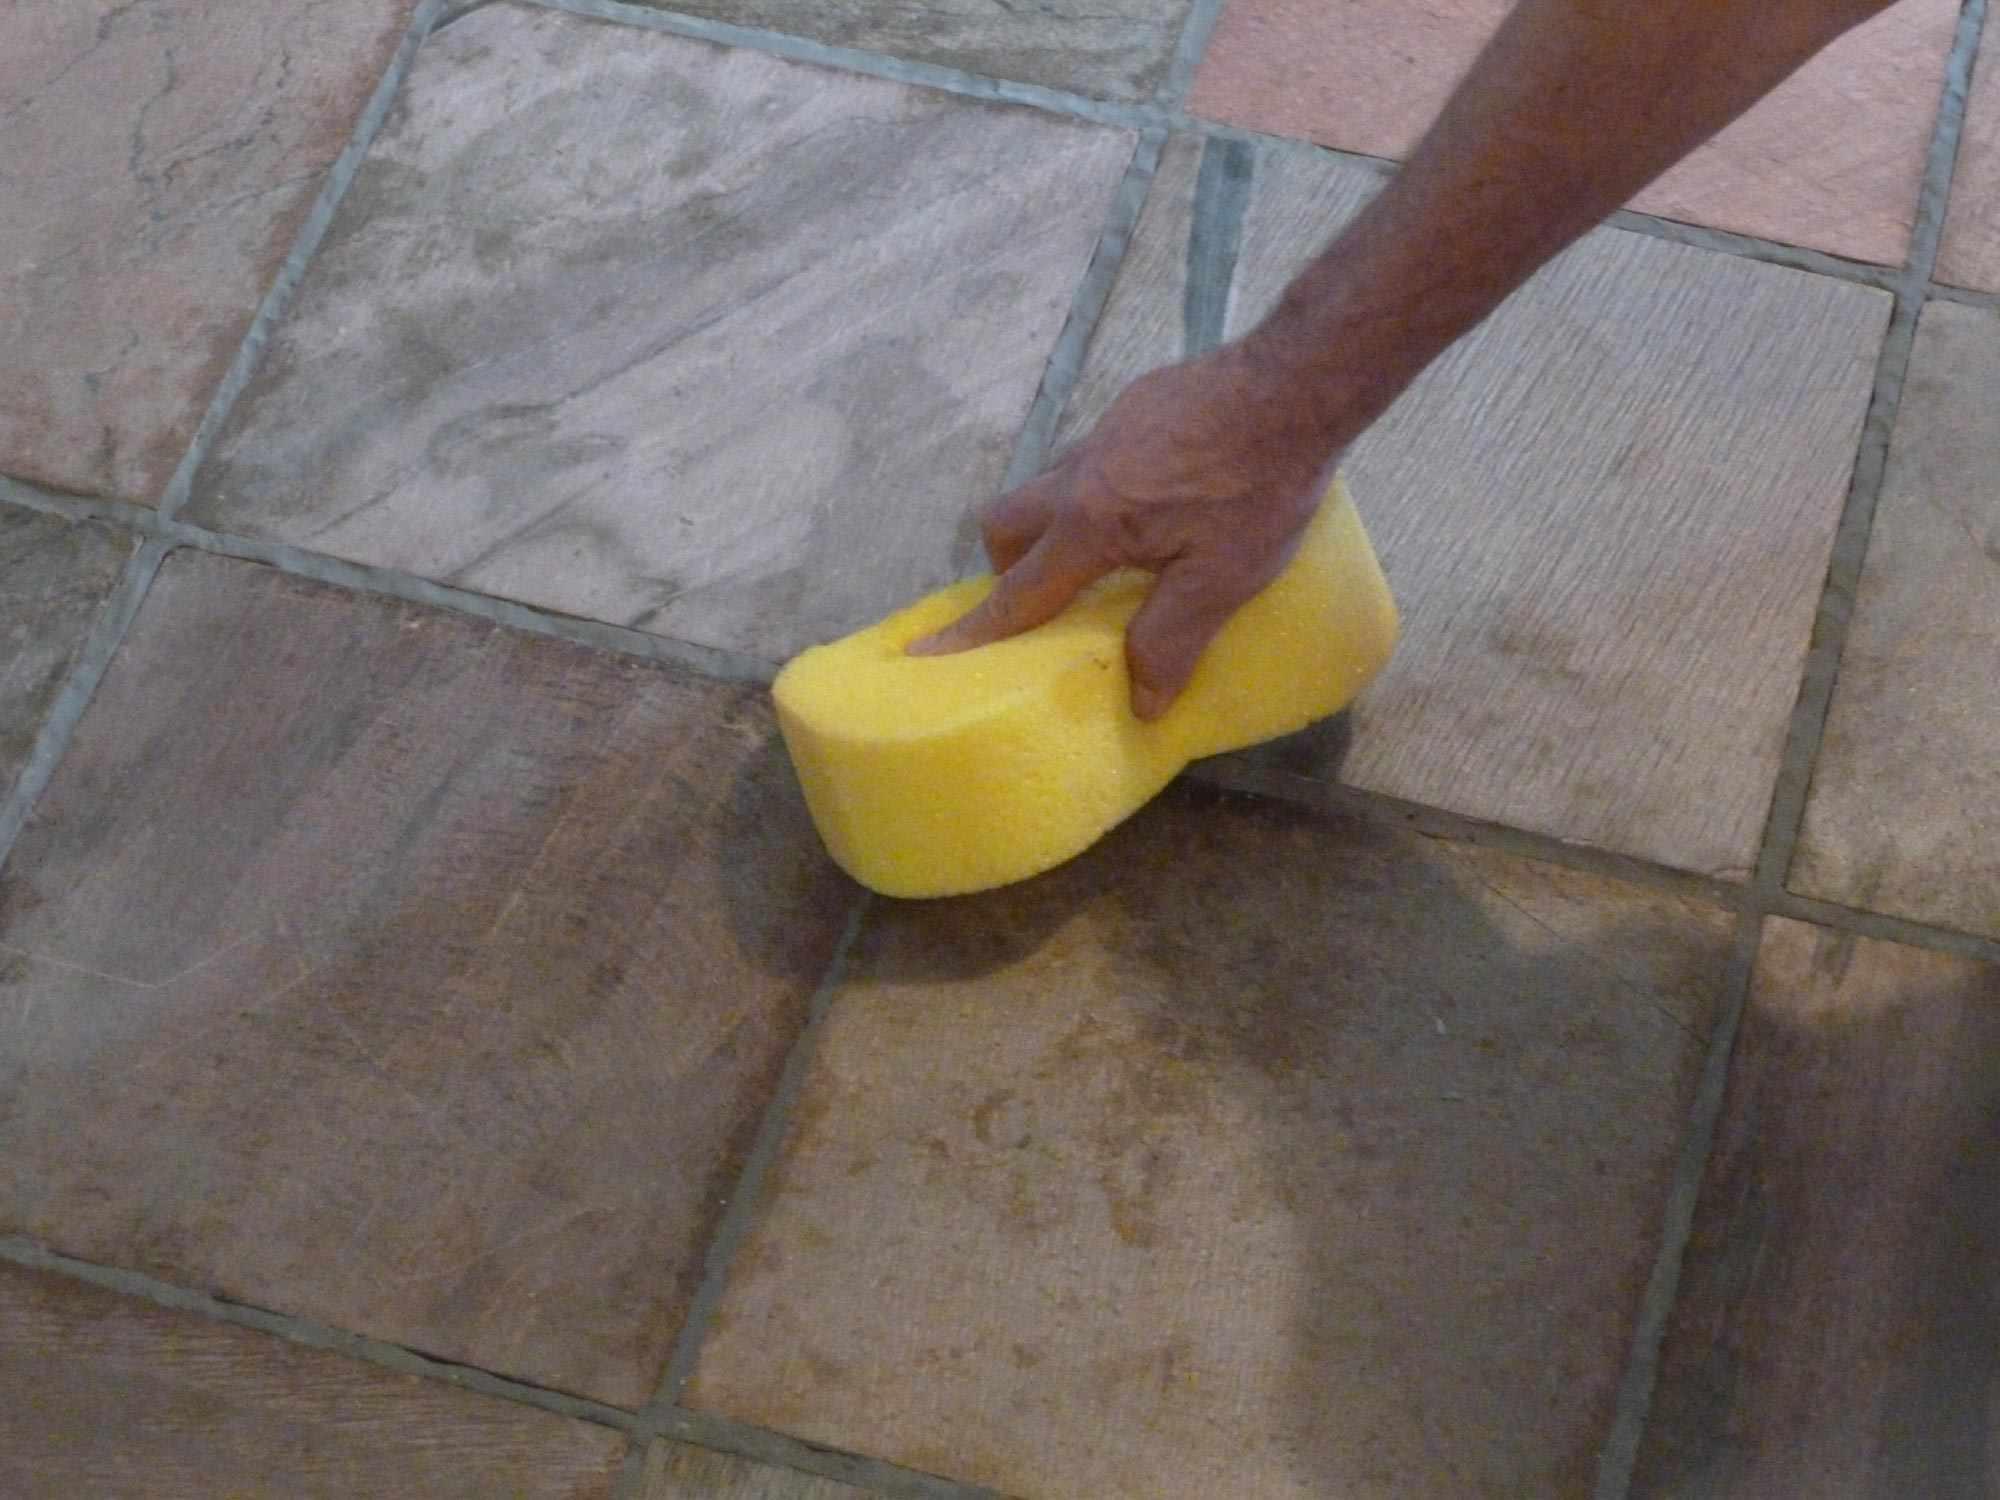 Cleaning Slate Floors